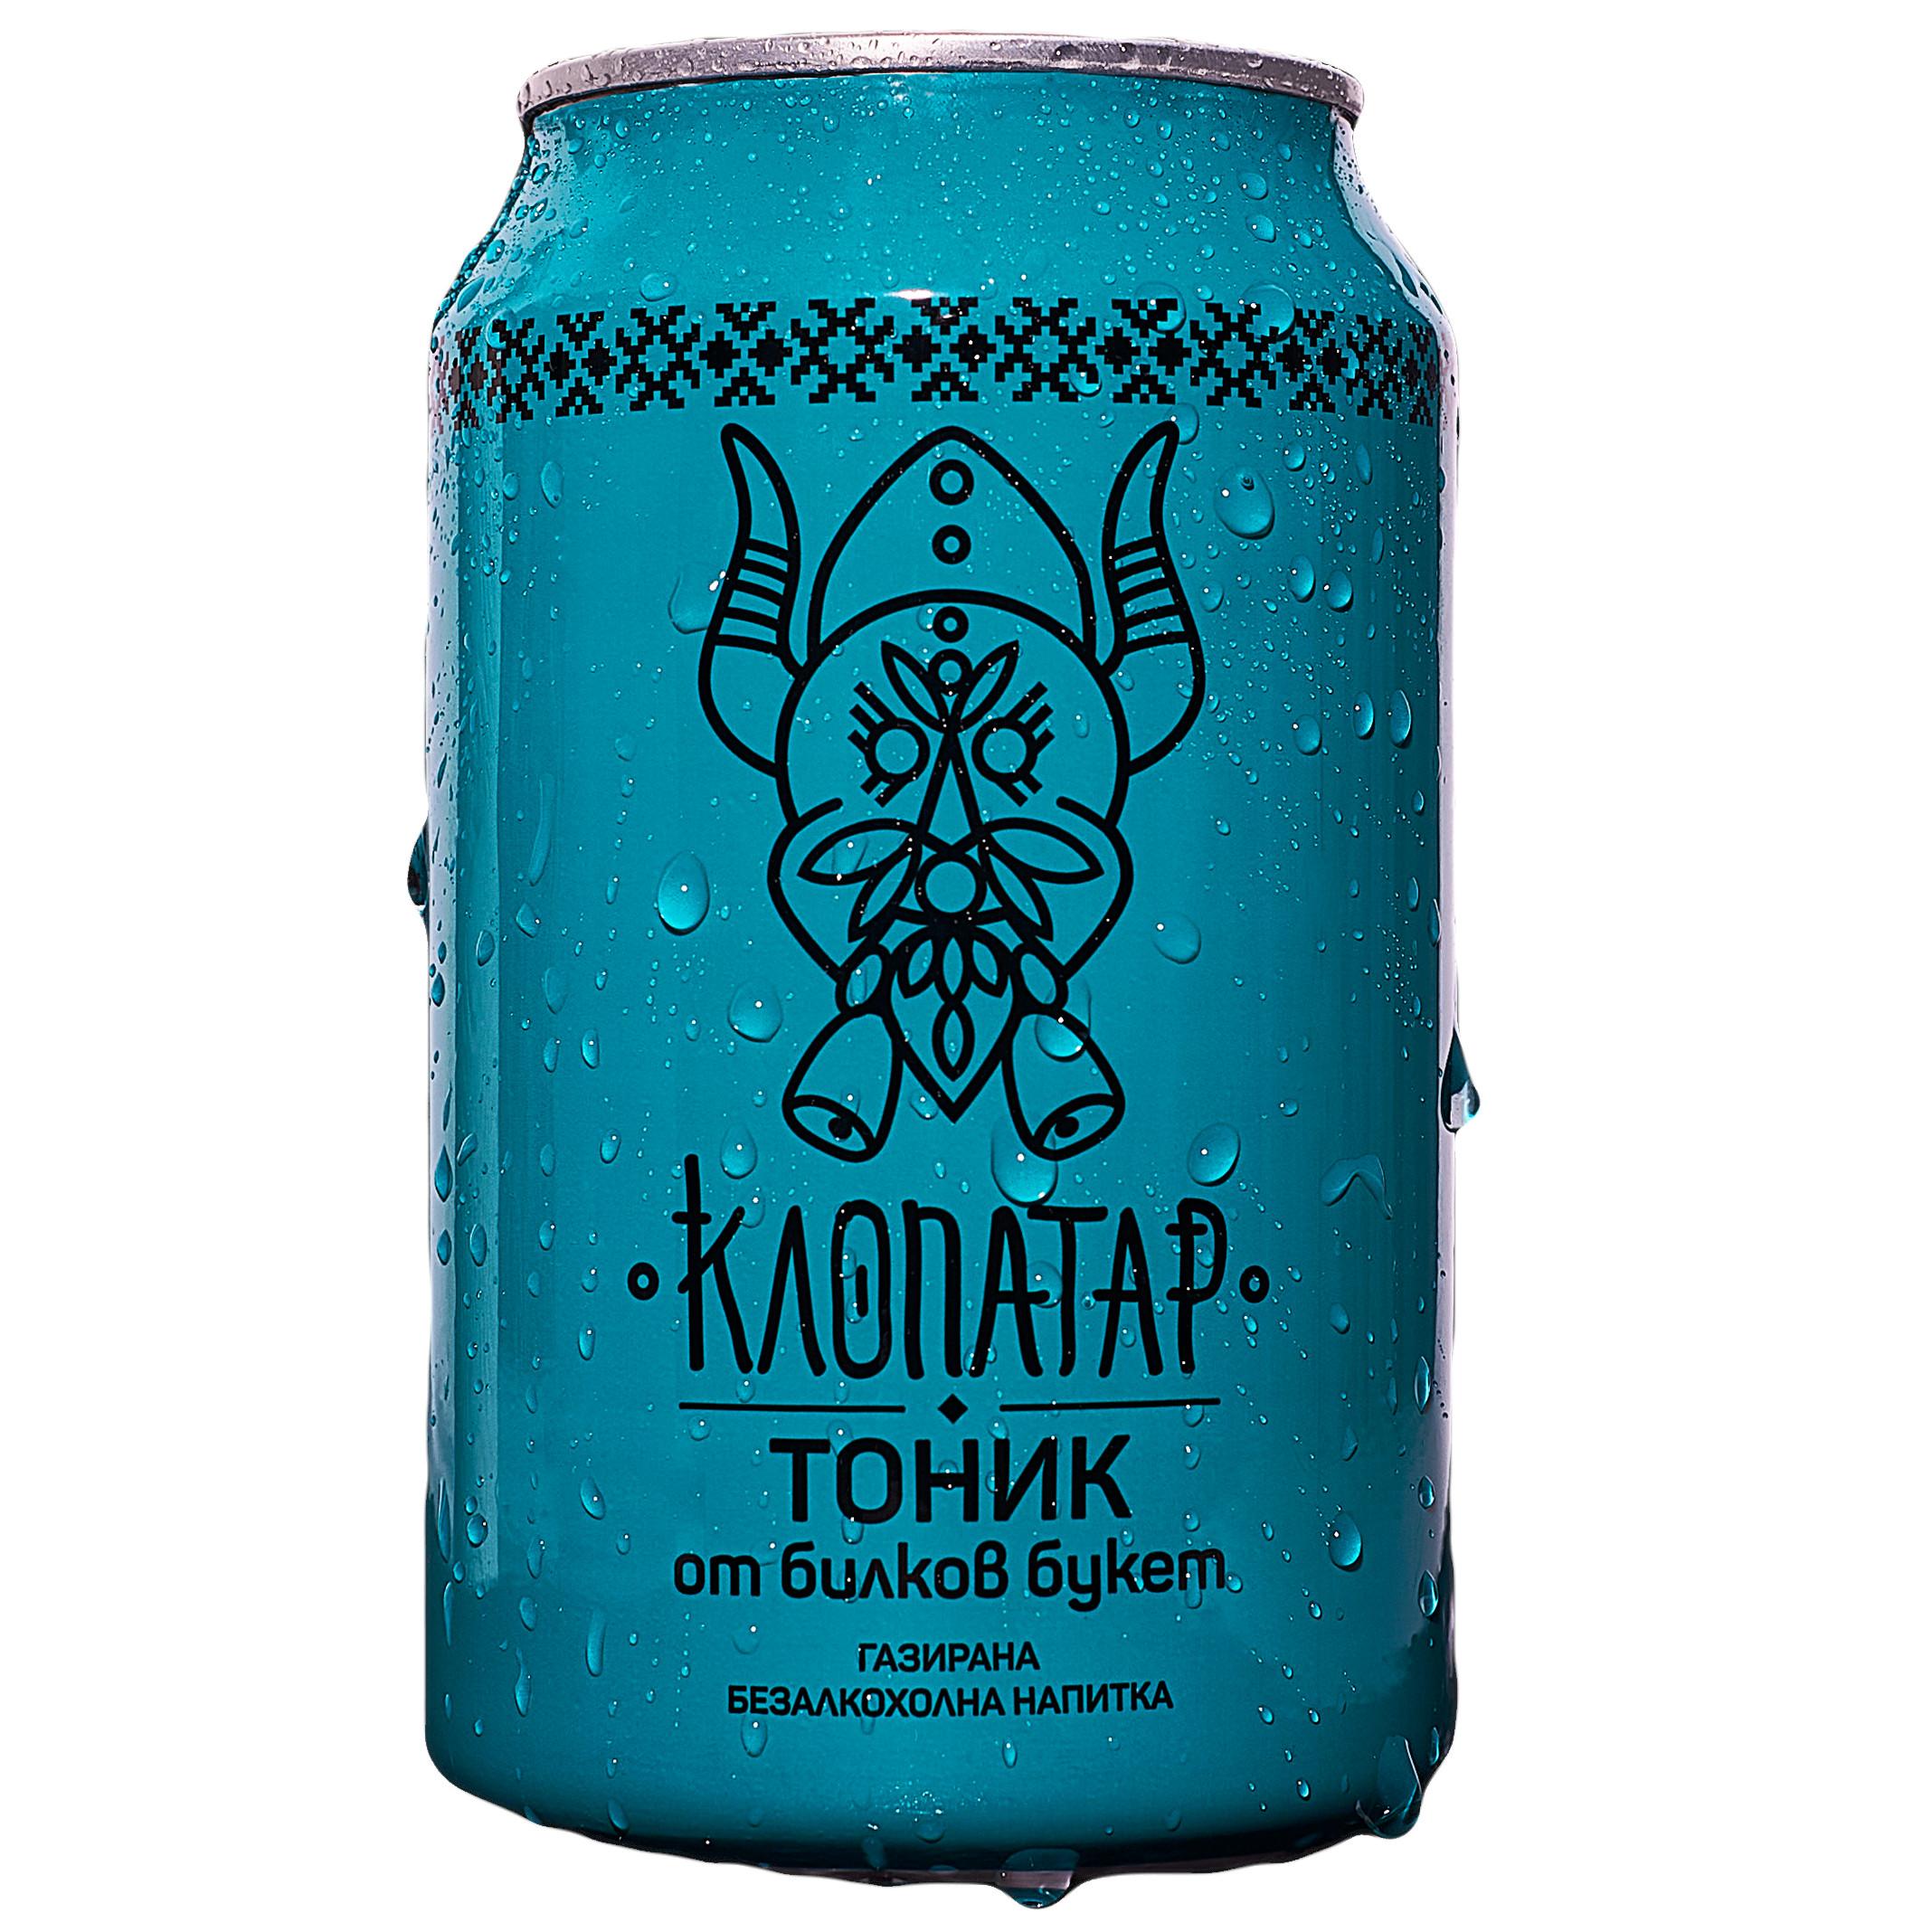 Клопатар Газирана Напитка Тоник 330мл